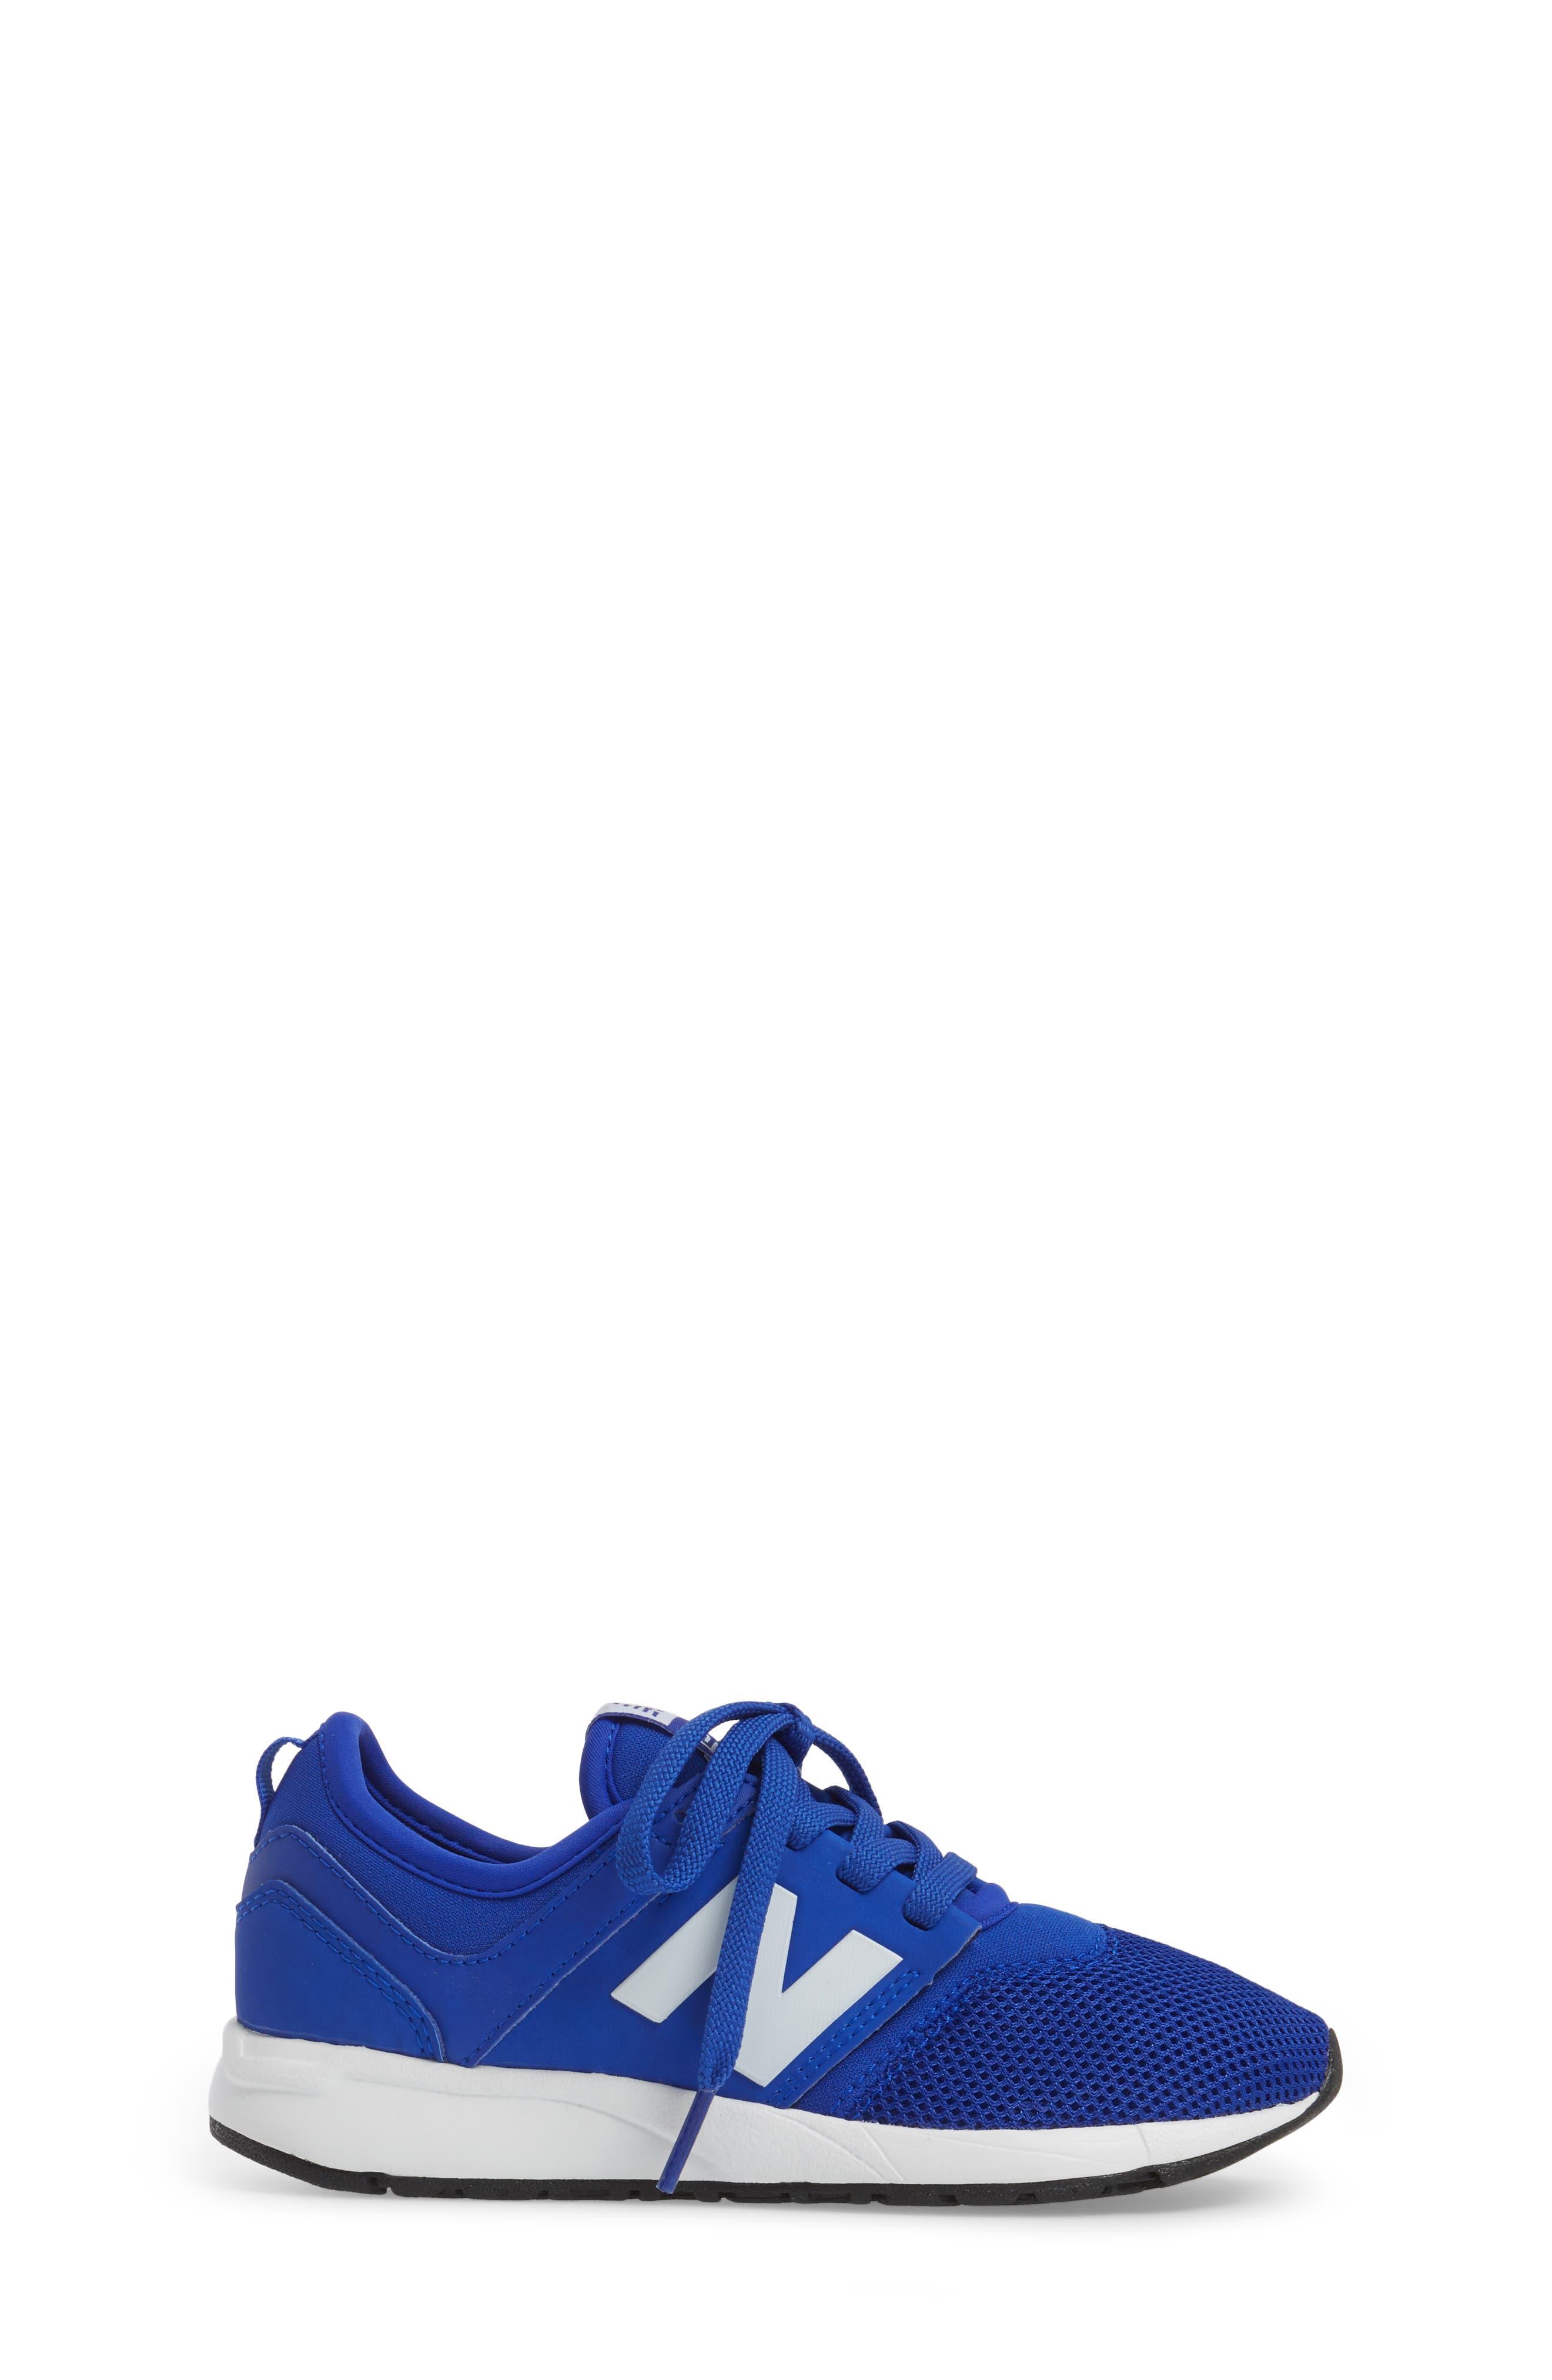 247 Core Sneaker,                             Alternate thumbnail 3, color,                             Blue/ White